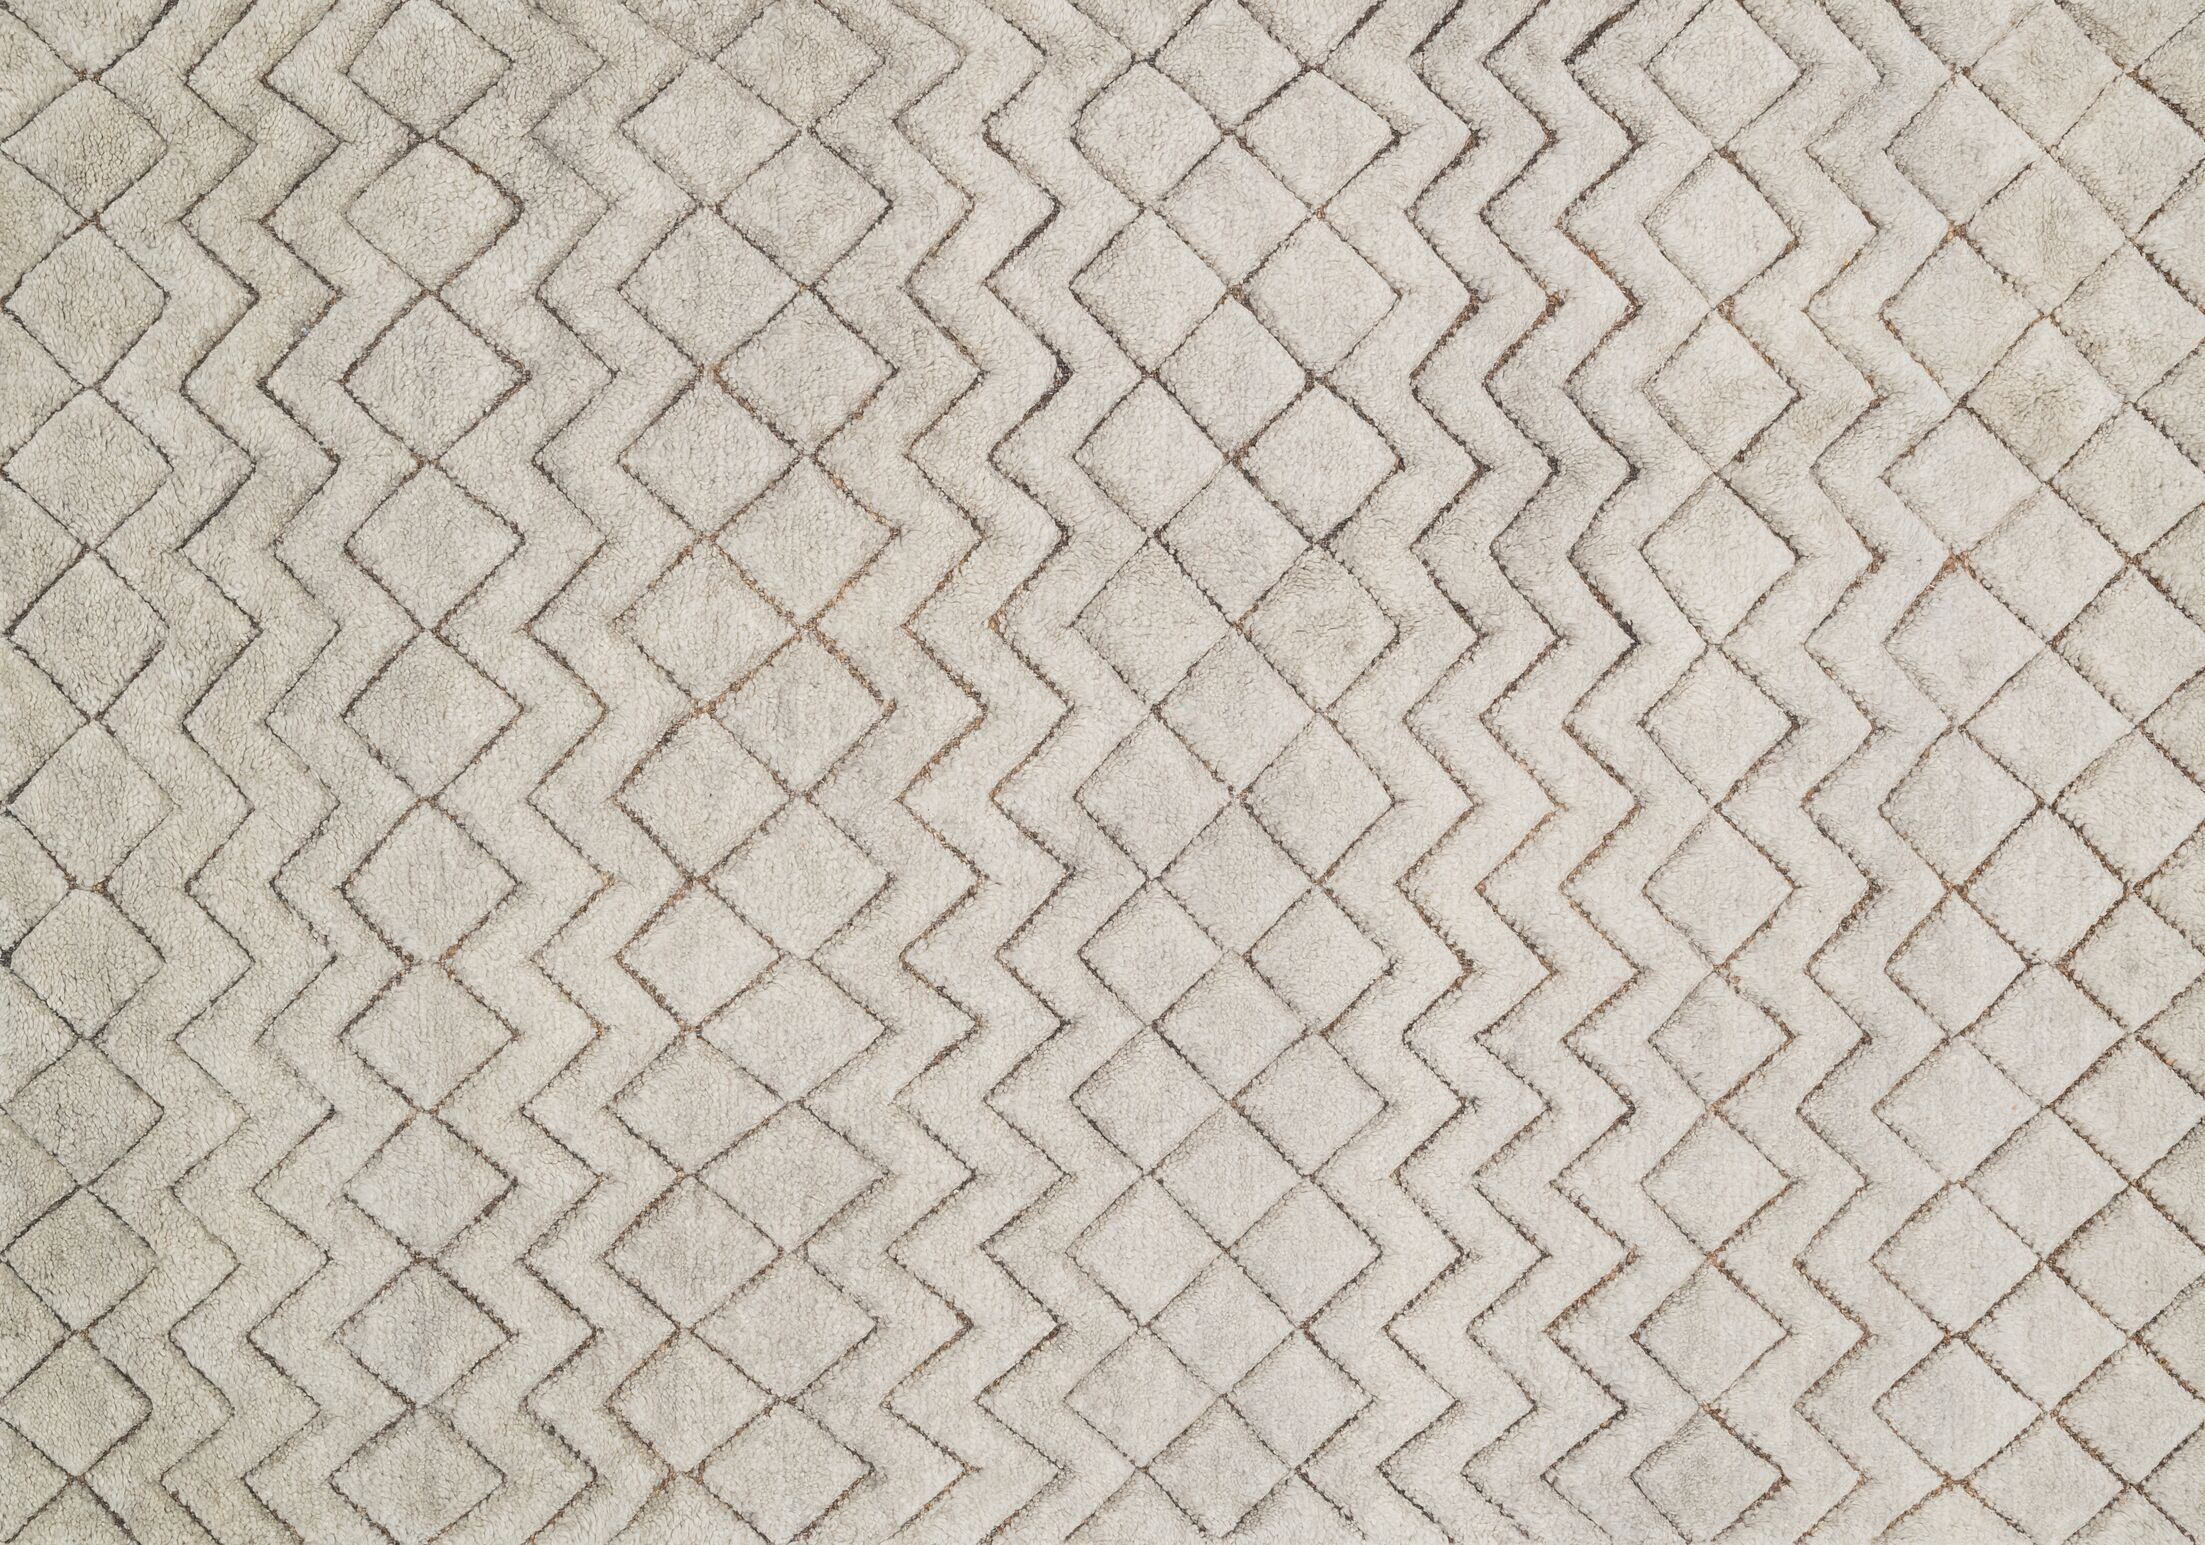 Paniagua Stone Area Rug Rug Size: Rectangle 5'6